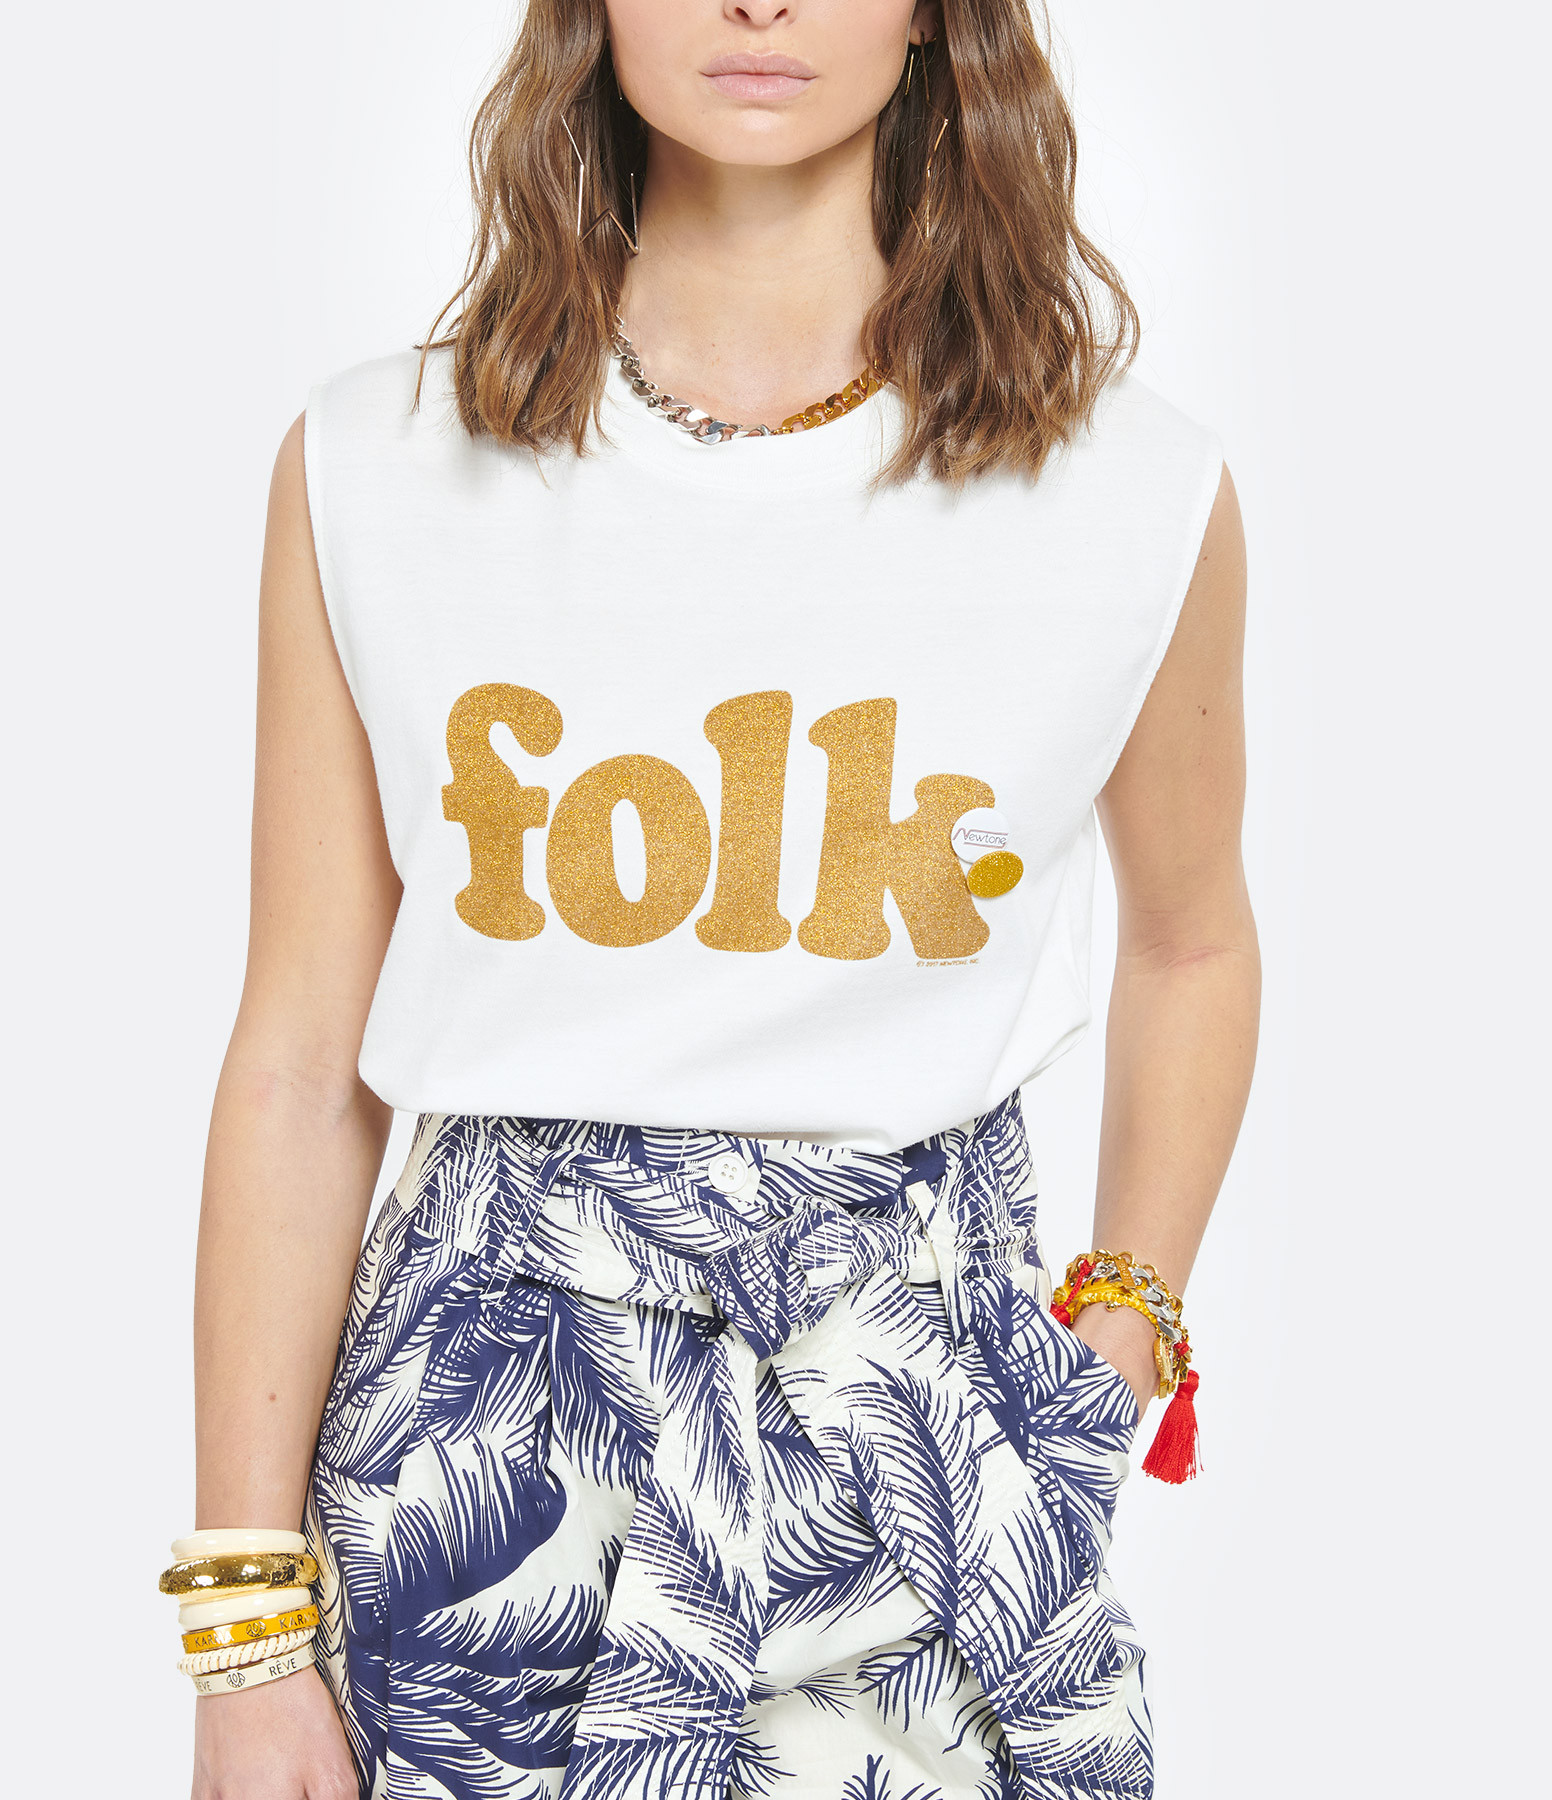 NEWTONE - Tee-shirt Biker Folk Coton Écru